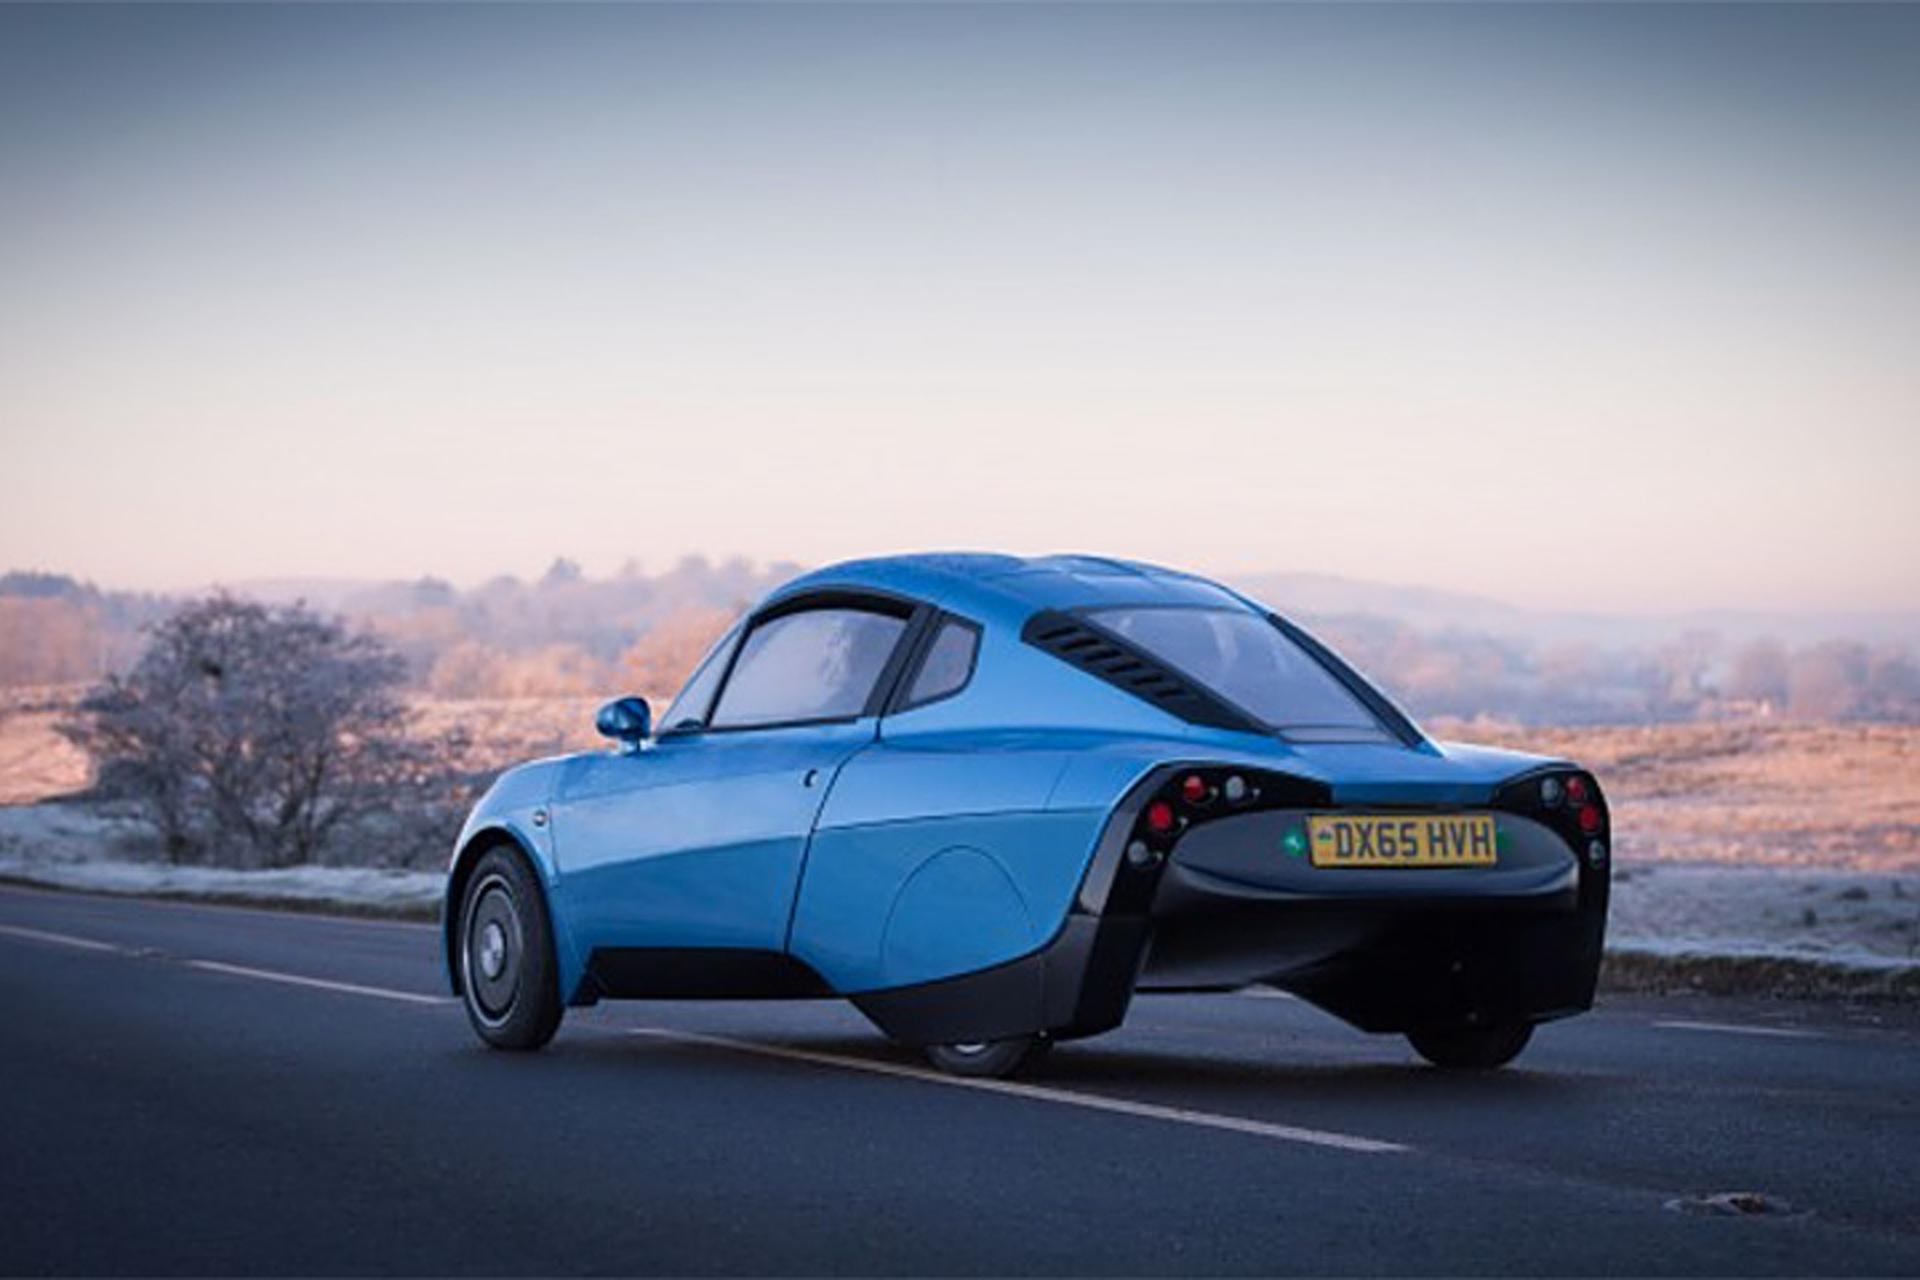 The Riversimple Rasa Hopes to Take Hydrogen Cars Mainstream